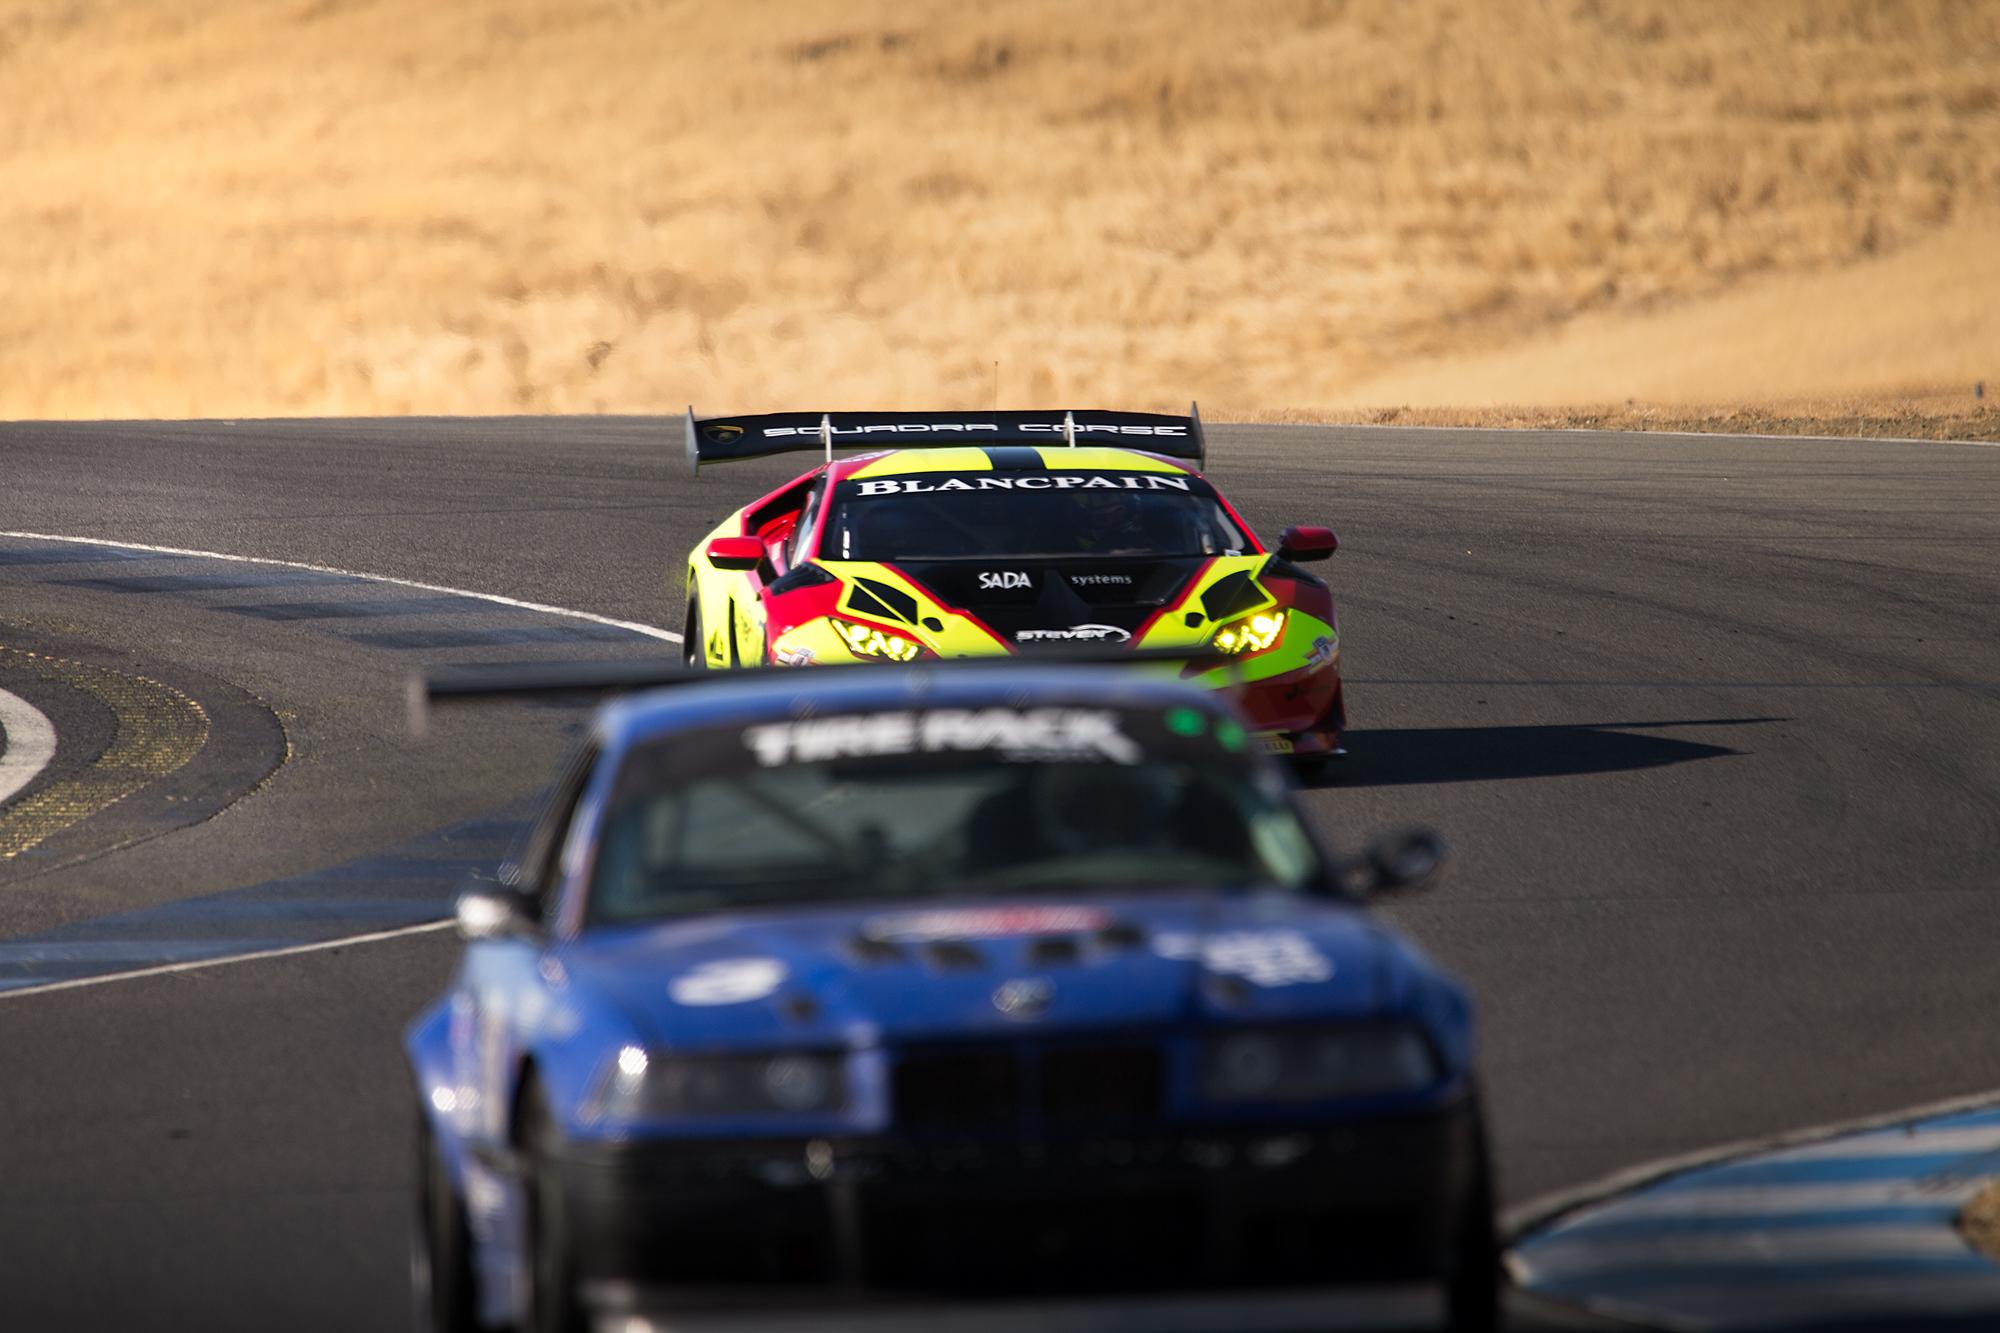 Steven-Racing-20171006-44935.jpg